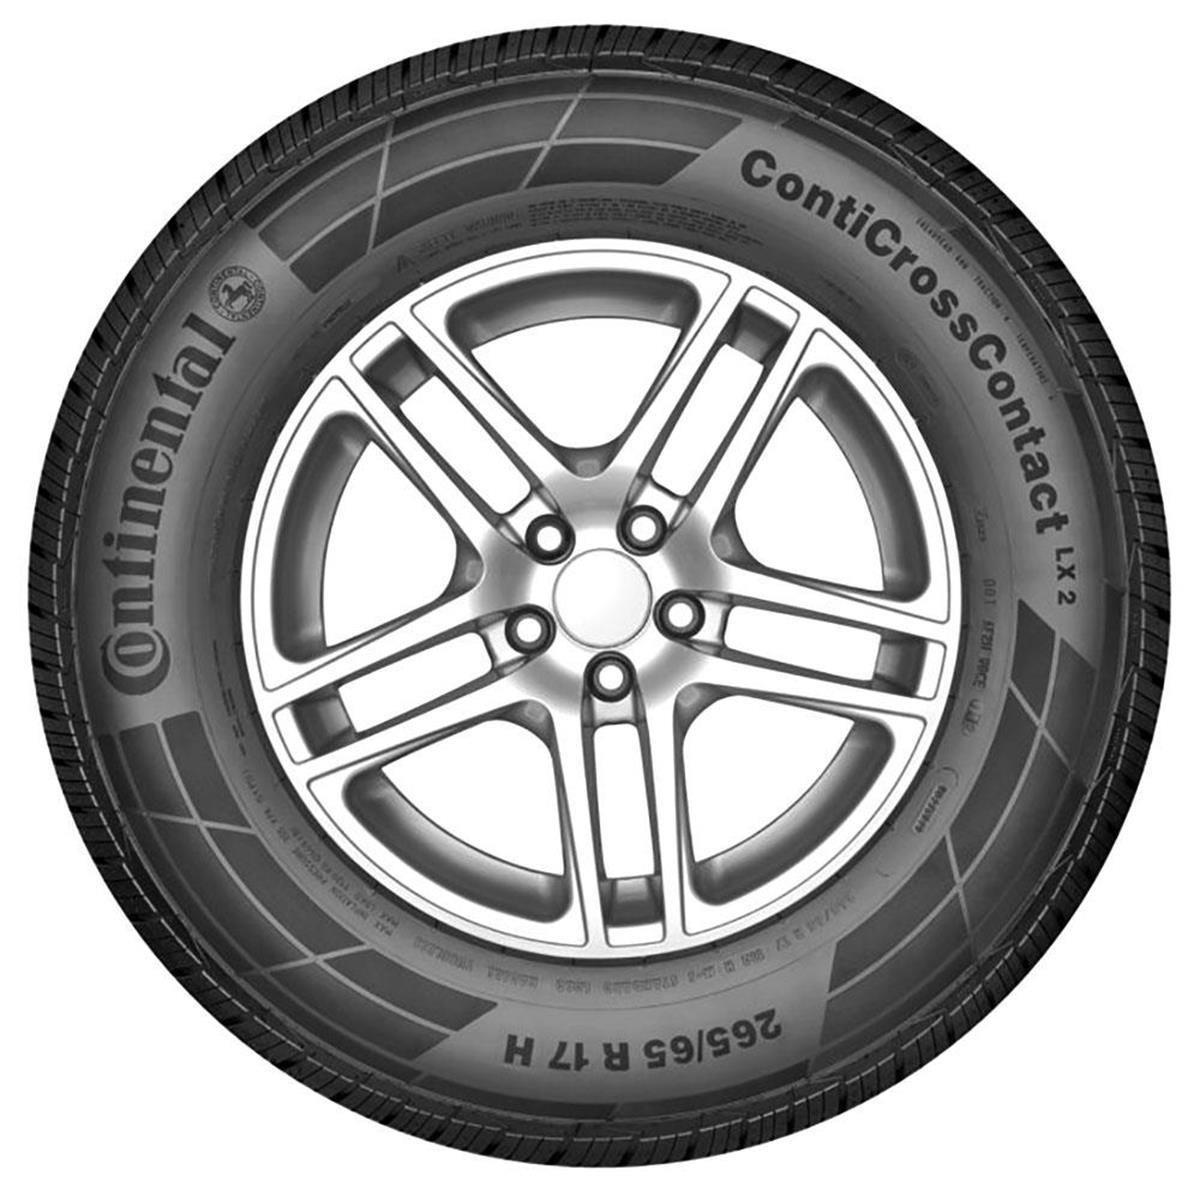 Pneu Continental 265/65R17 112H FR ContiCrossContact LX 2